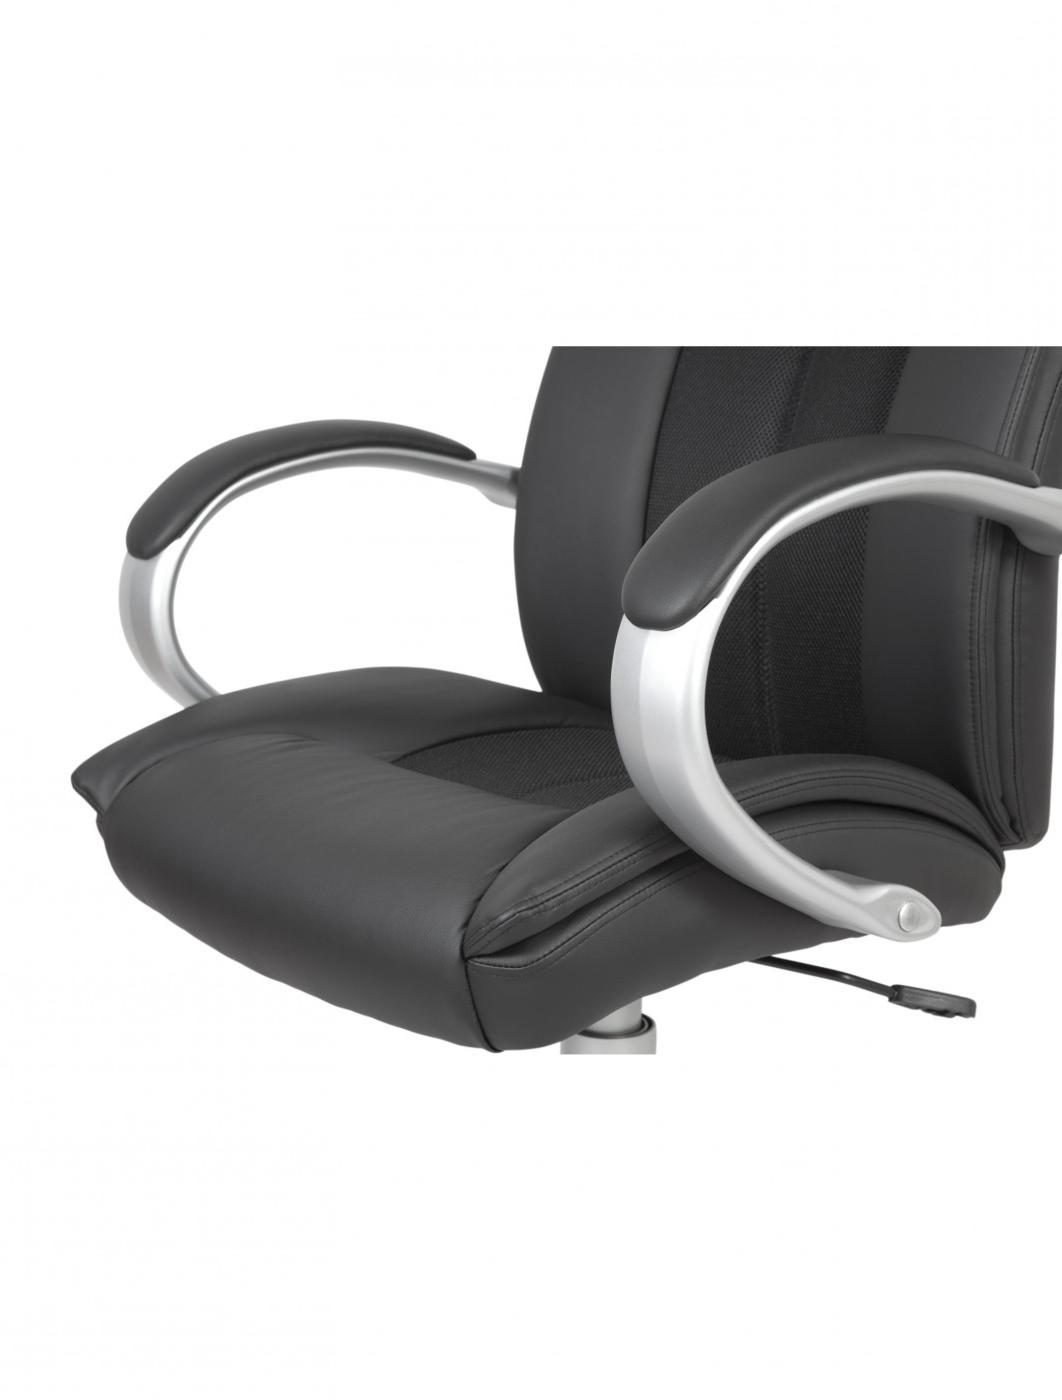 Executive Office Chairs With Shiatsu Massager In Preferred Shiatsu Massage Chair (View 4 of 20)